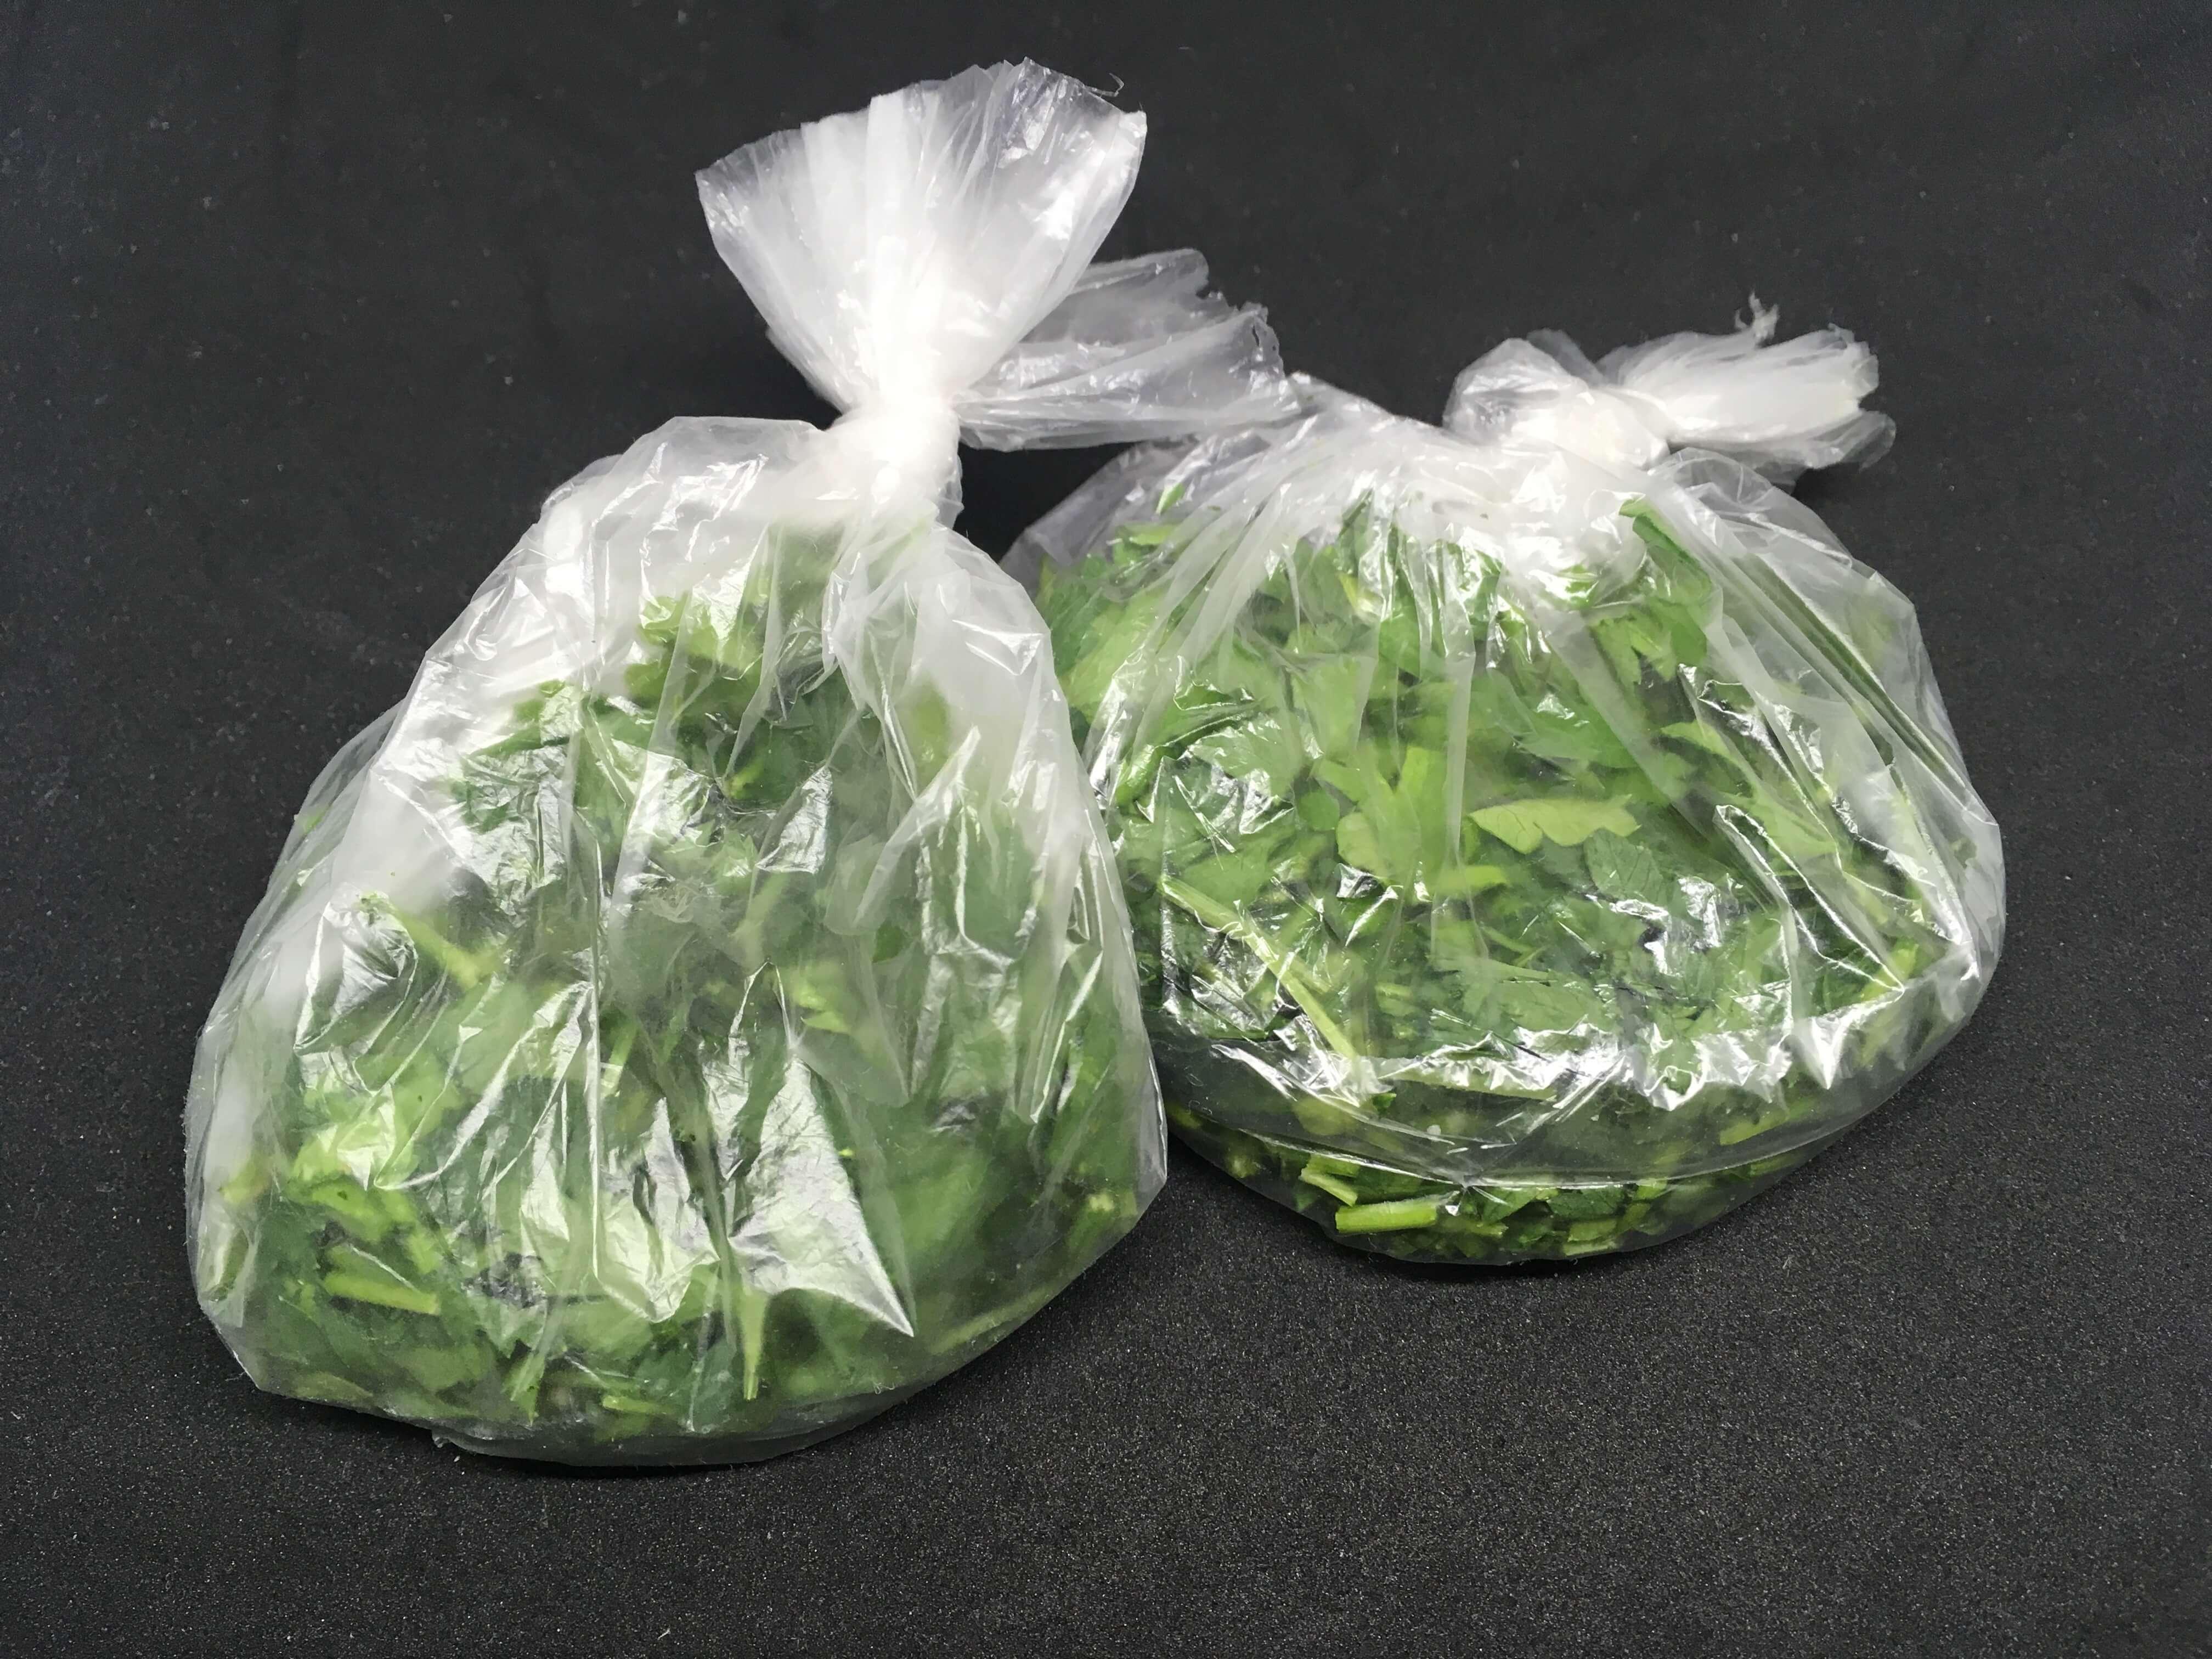 На фото: нарезанная петрушка, расфасованная по пакетам (авторское фото)